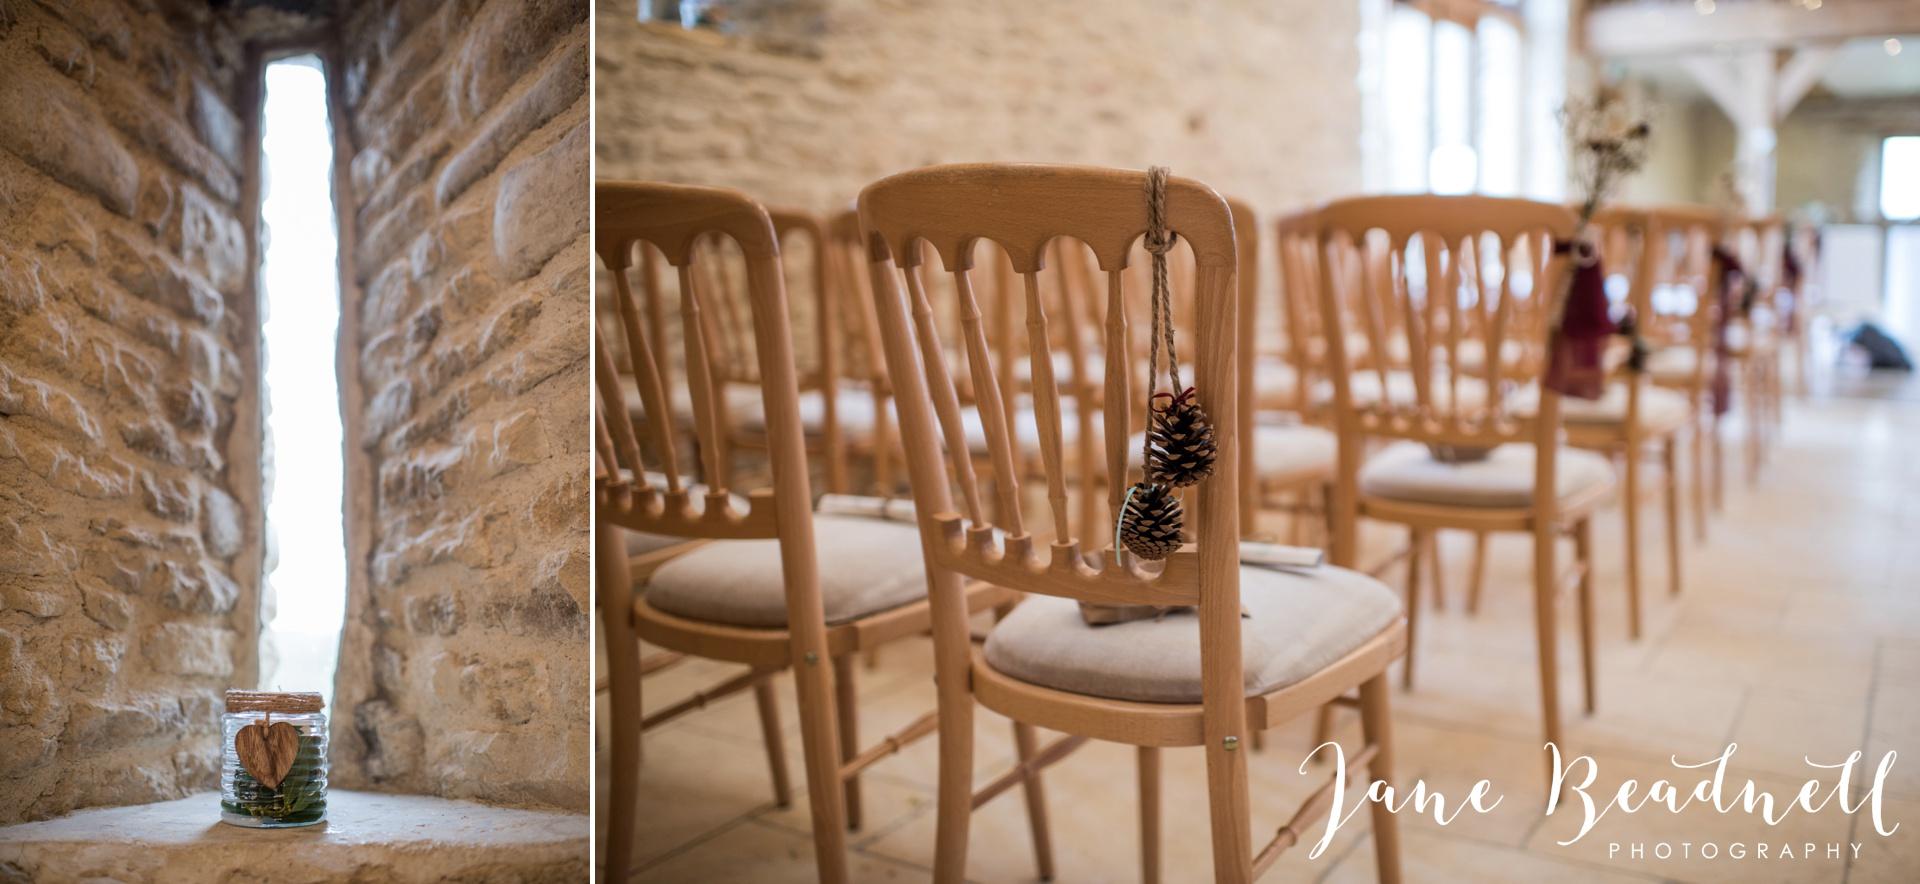 The Kingcote Barn Bristol Yorkshire and destination wedding photographer Jane Beadnell Photography_0025